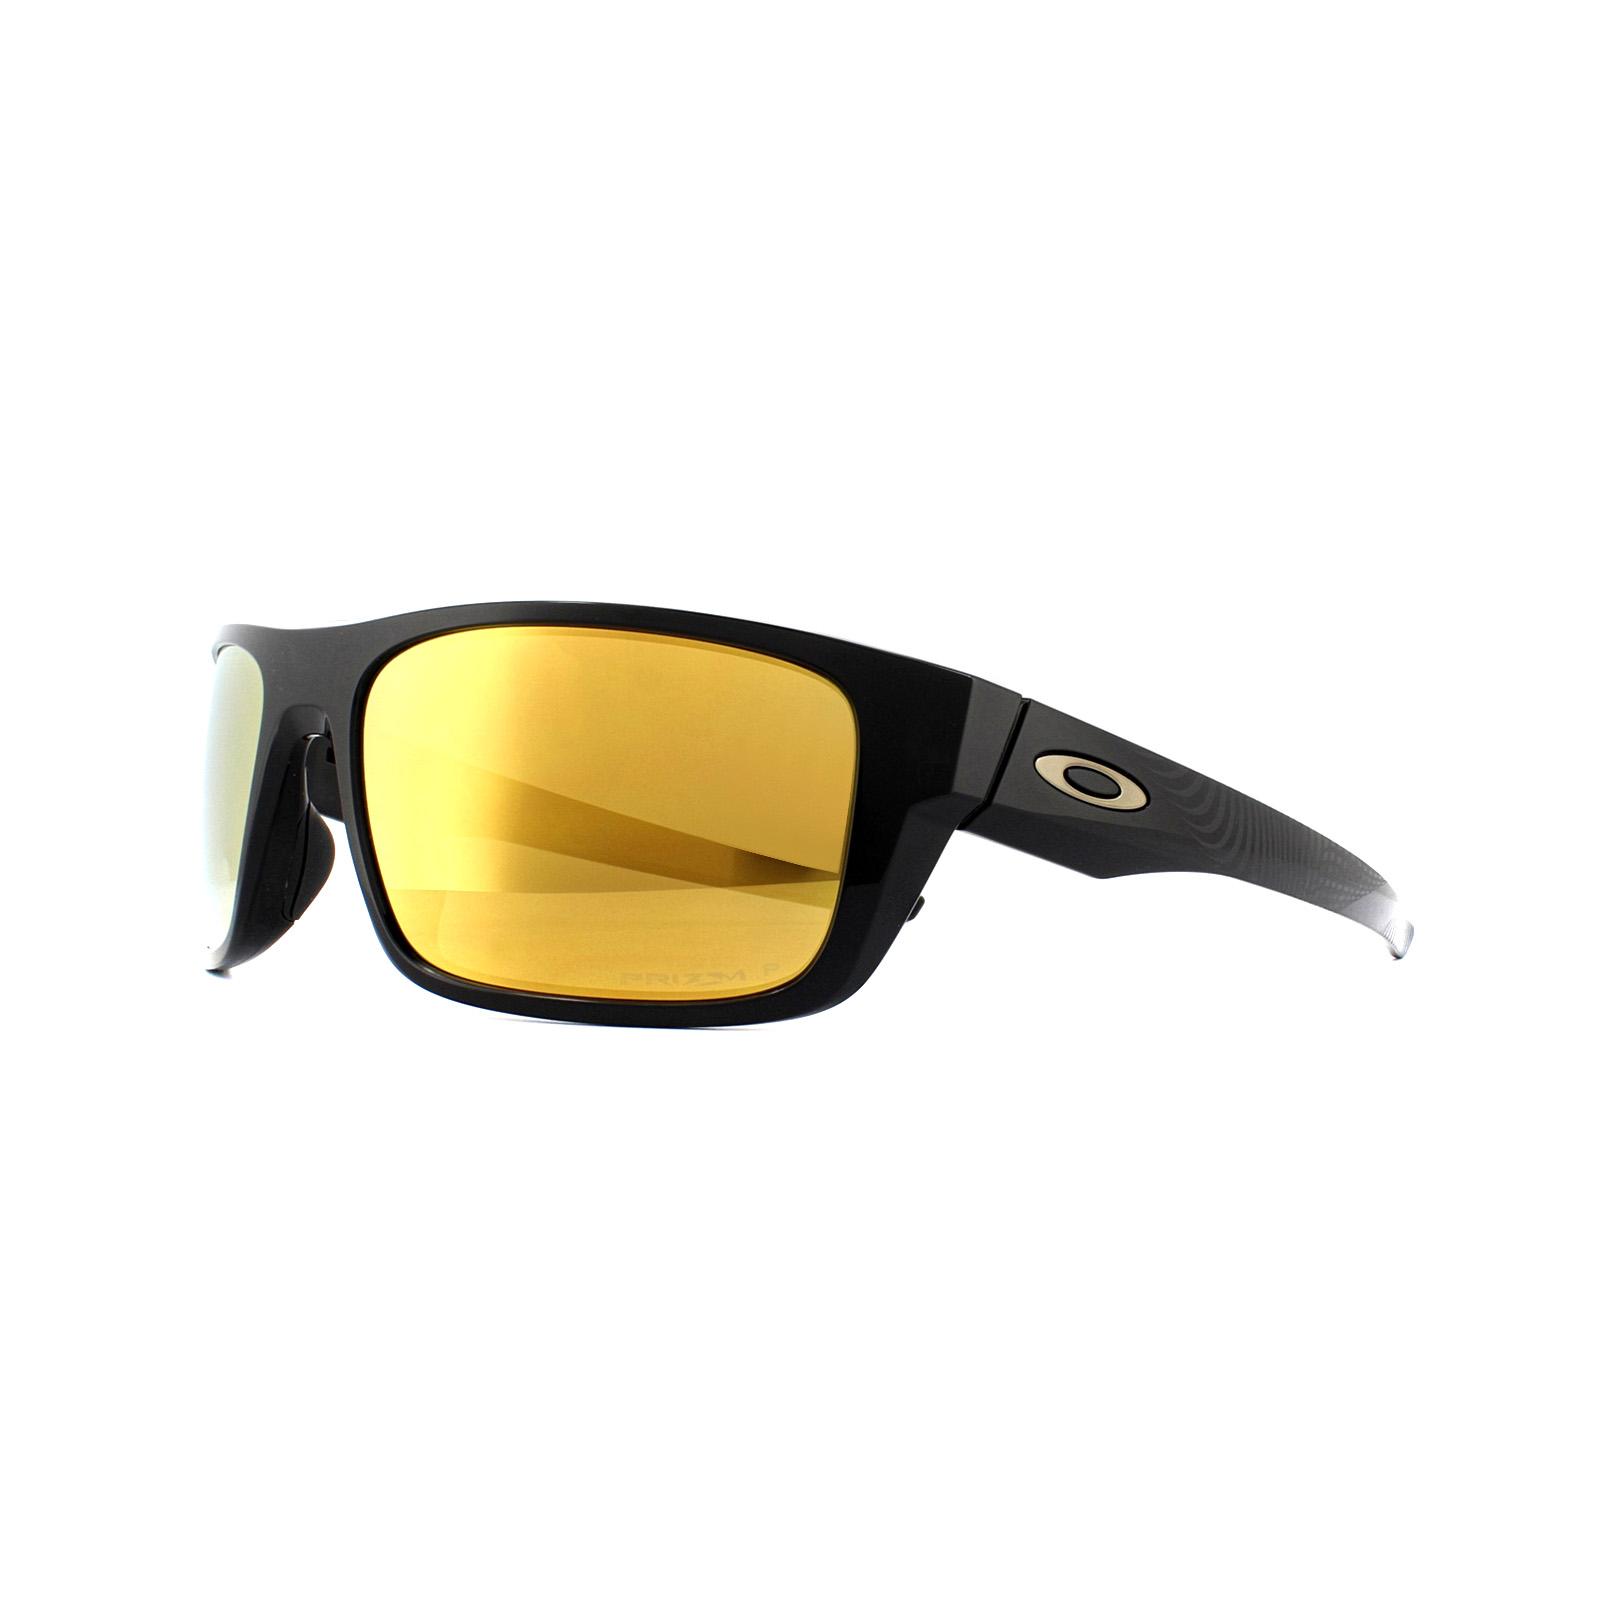 c02b842e0a4 Sentinel Oakley Sunglasses Drop Point OO9367-21 Polished Black Prizm 24k  Polarized